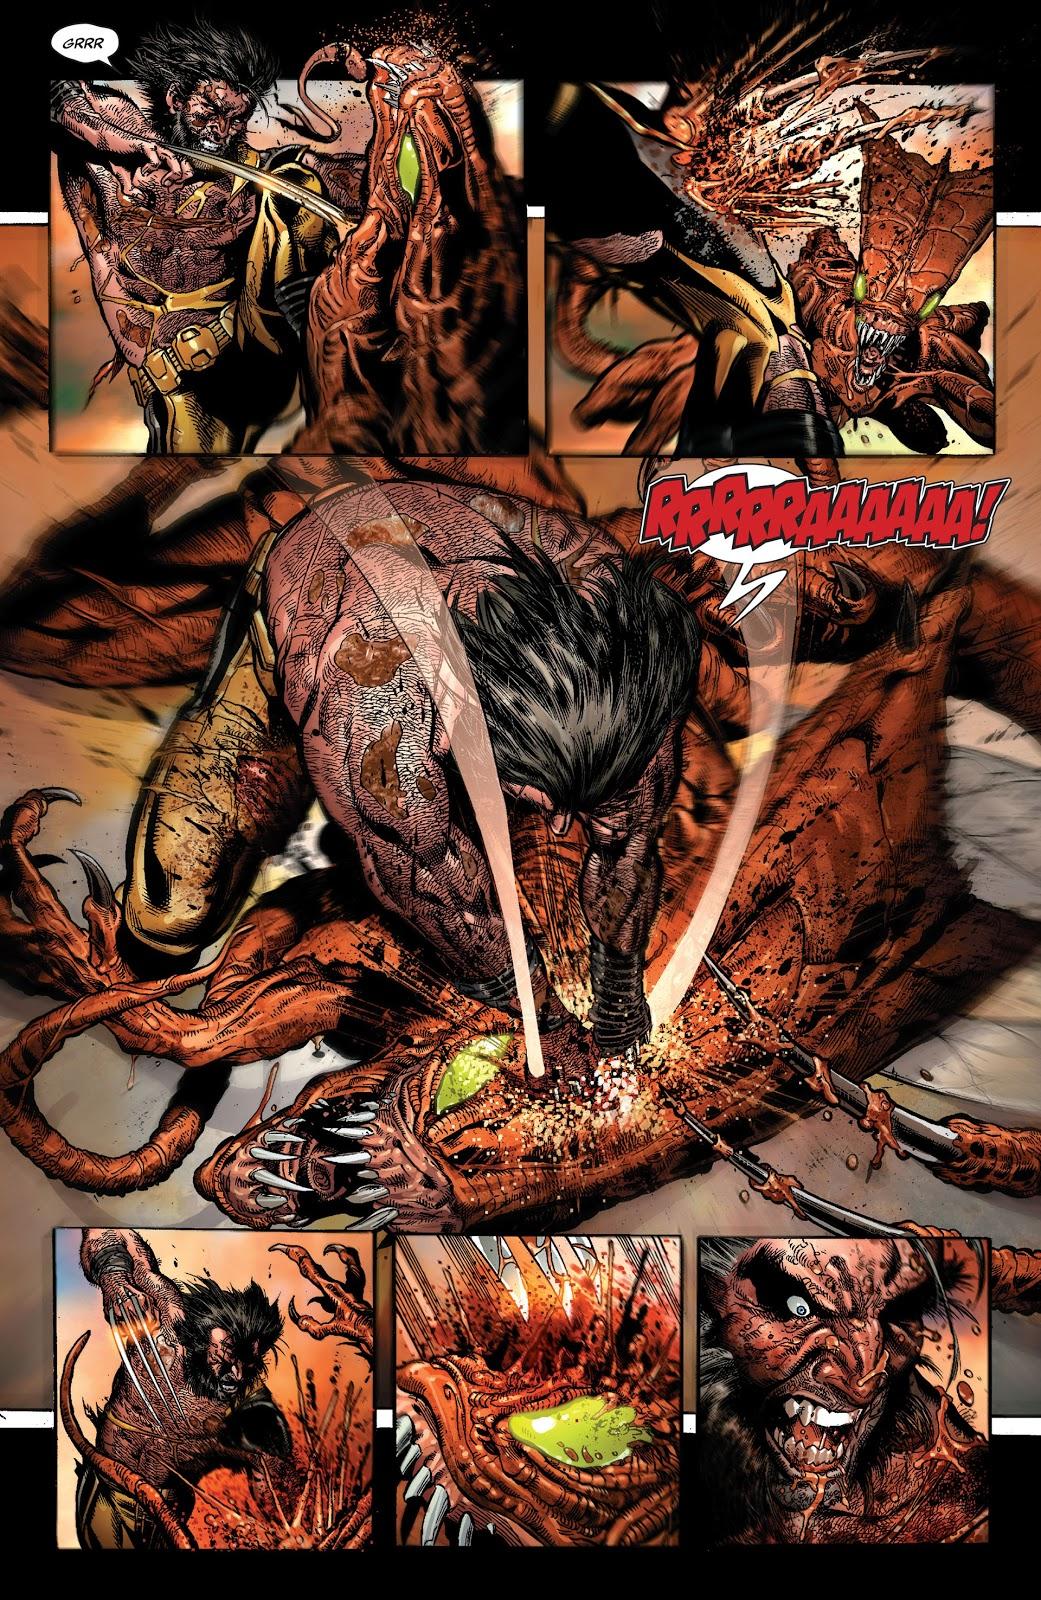 Astonishing X-Men Exogenetic review